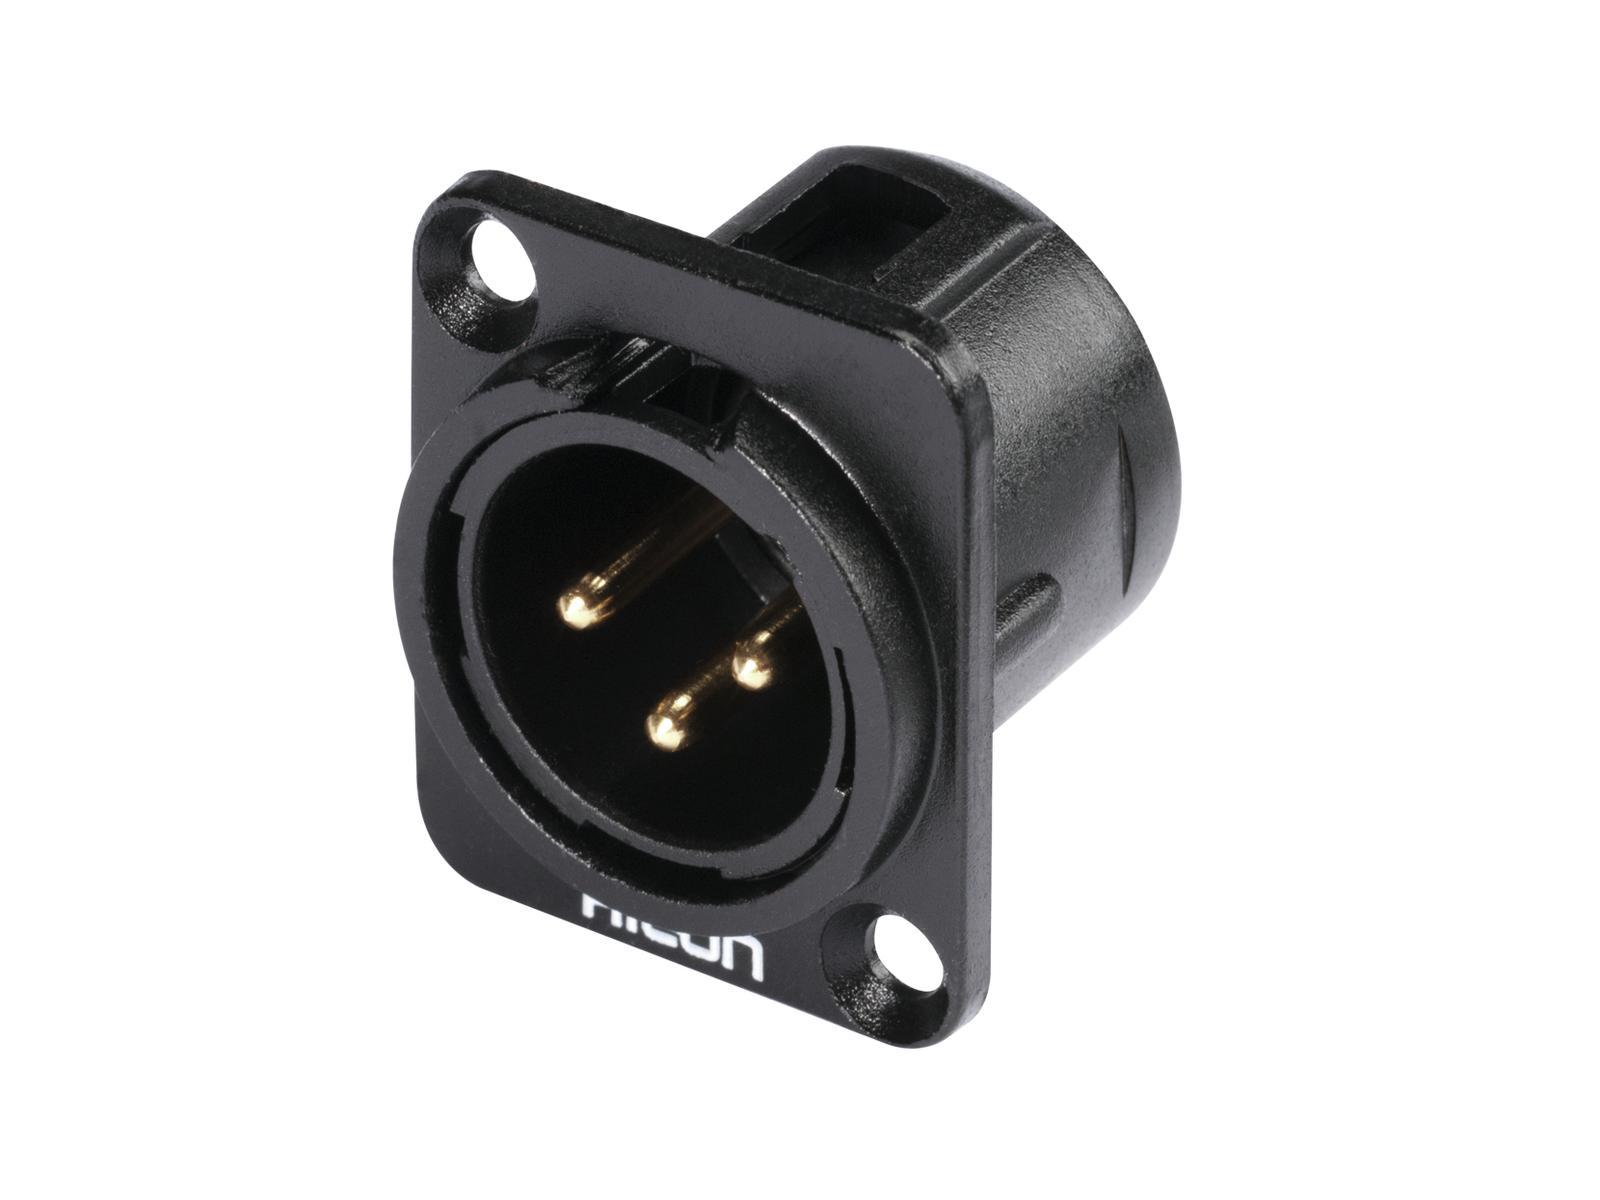 HICON XLR montaggio plug 3pin HI-X3DM